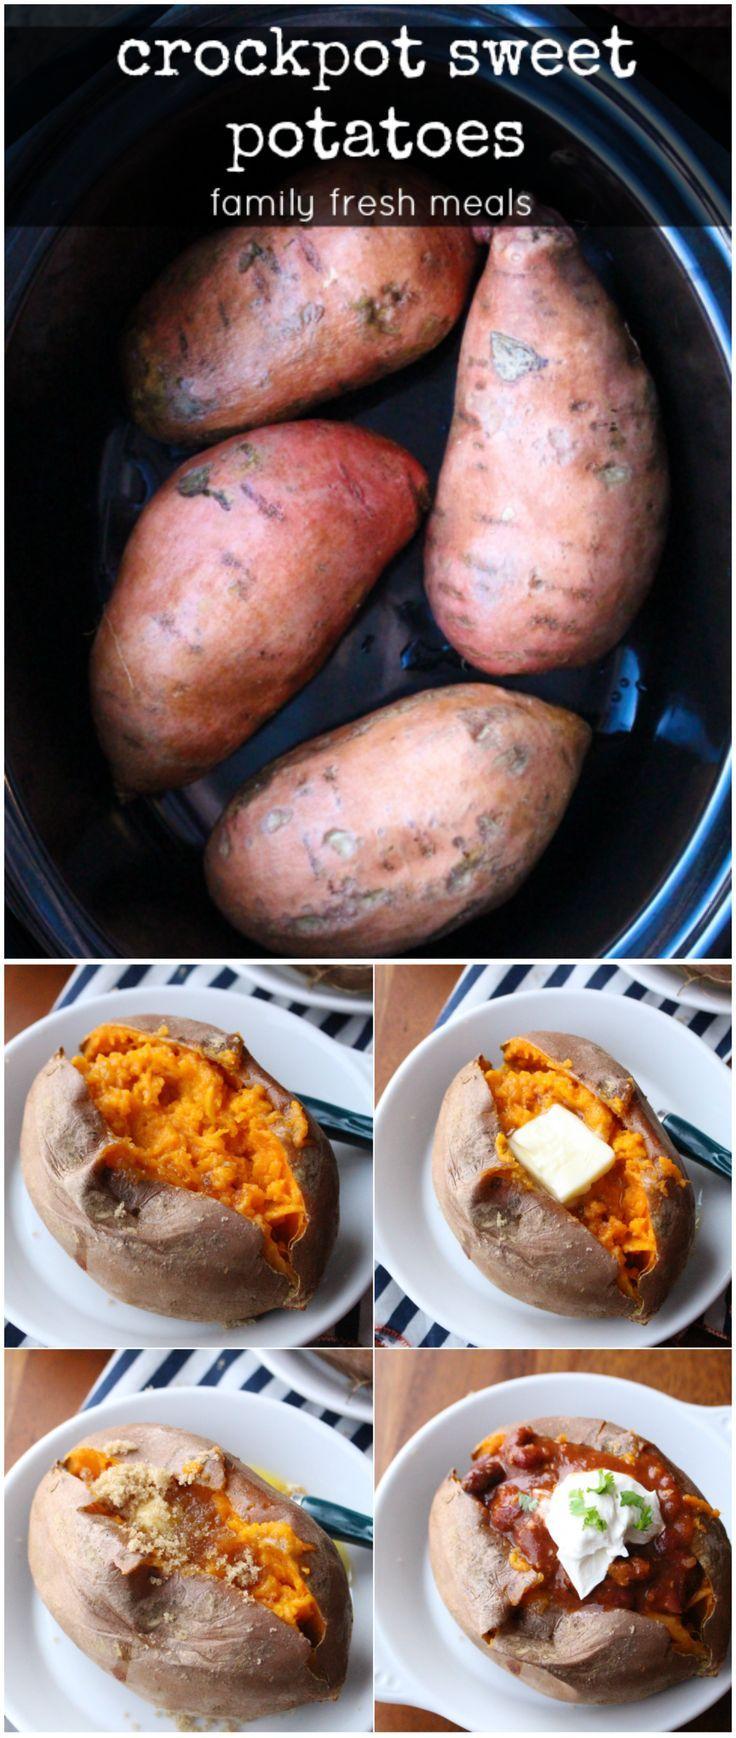 How to make Crockpot Sweet Potatoes